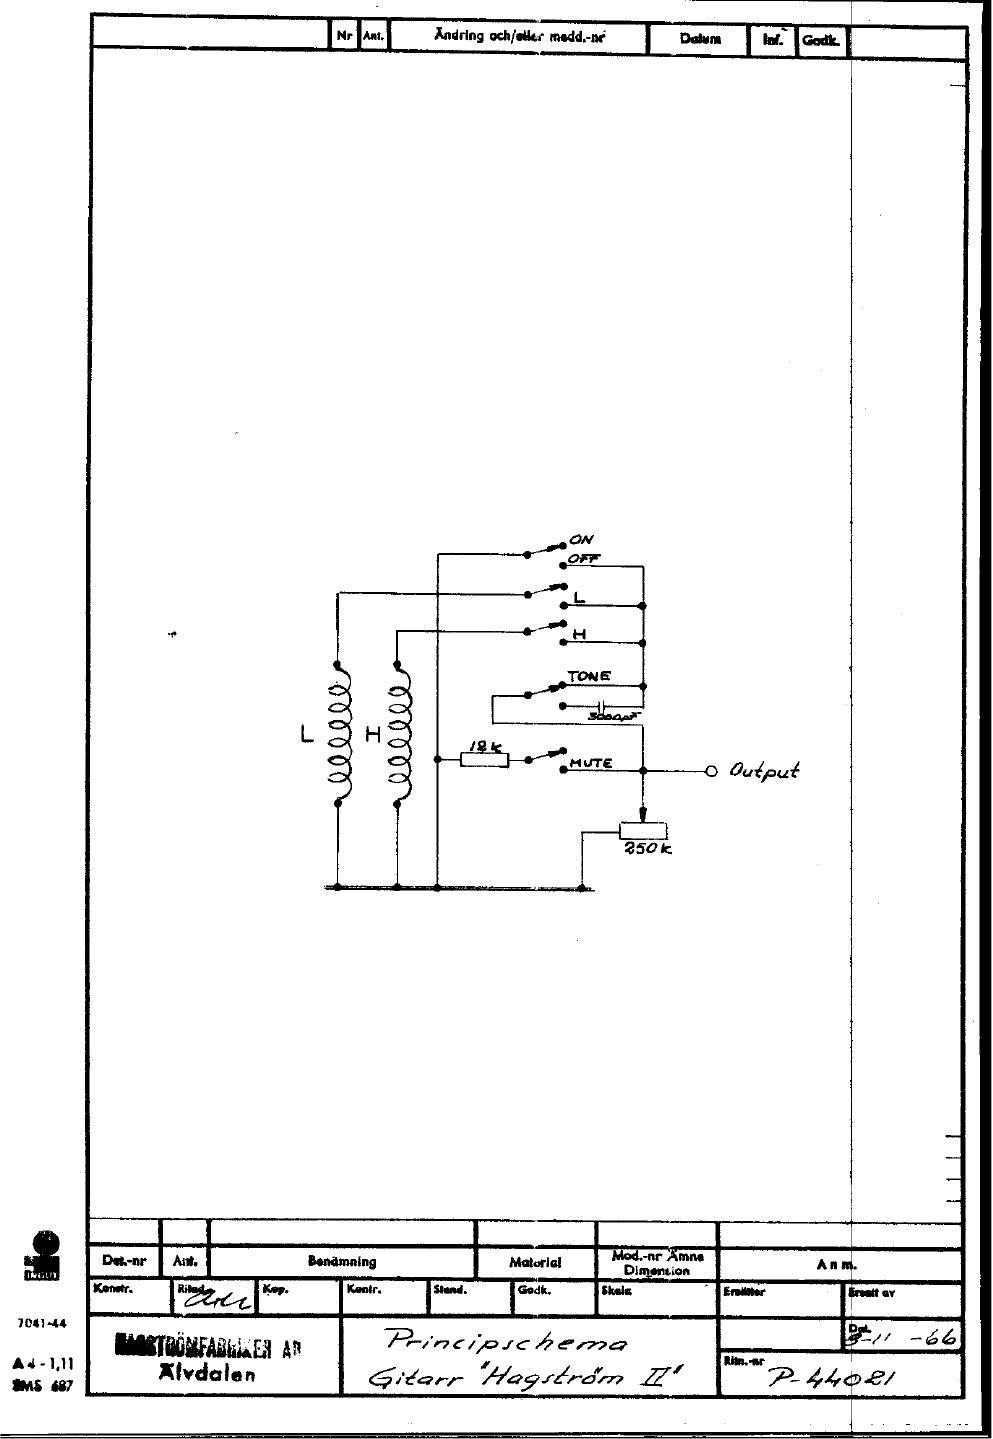 hight resolution of hagstrom wiring diagram wiring diagrams michael kelly wiring diagram hagstrom wiring diagram